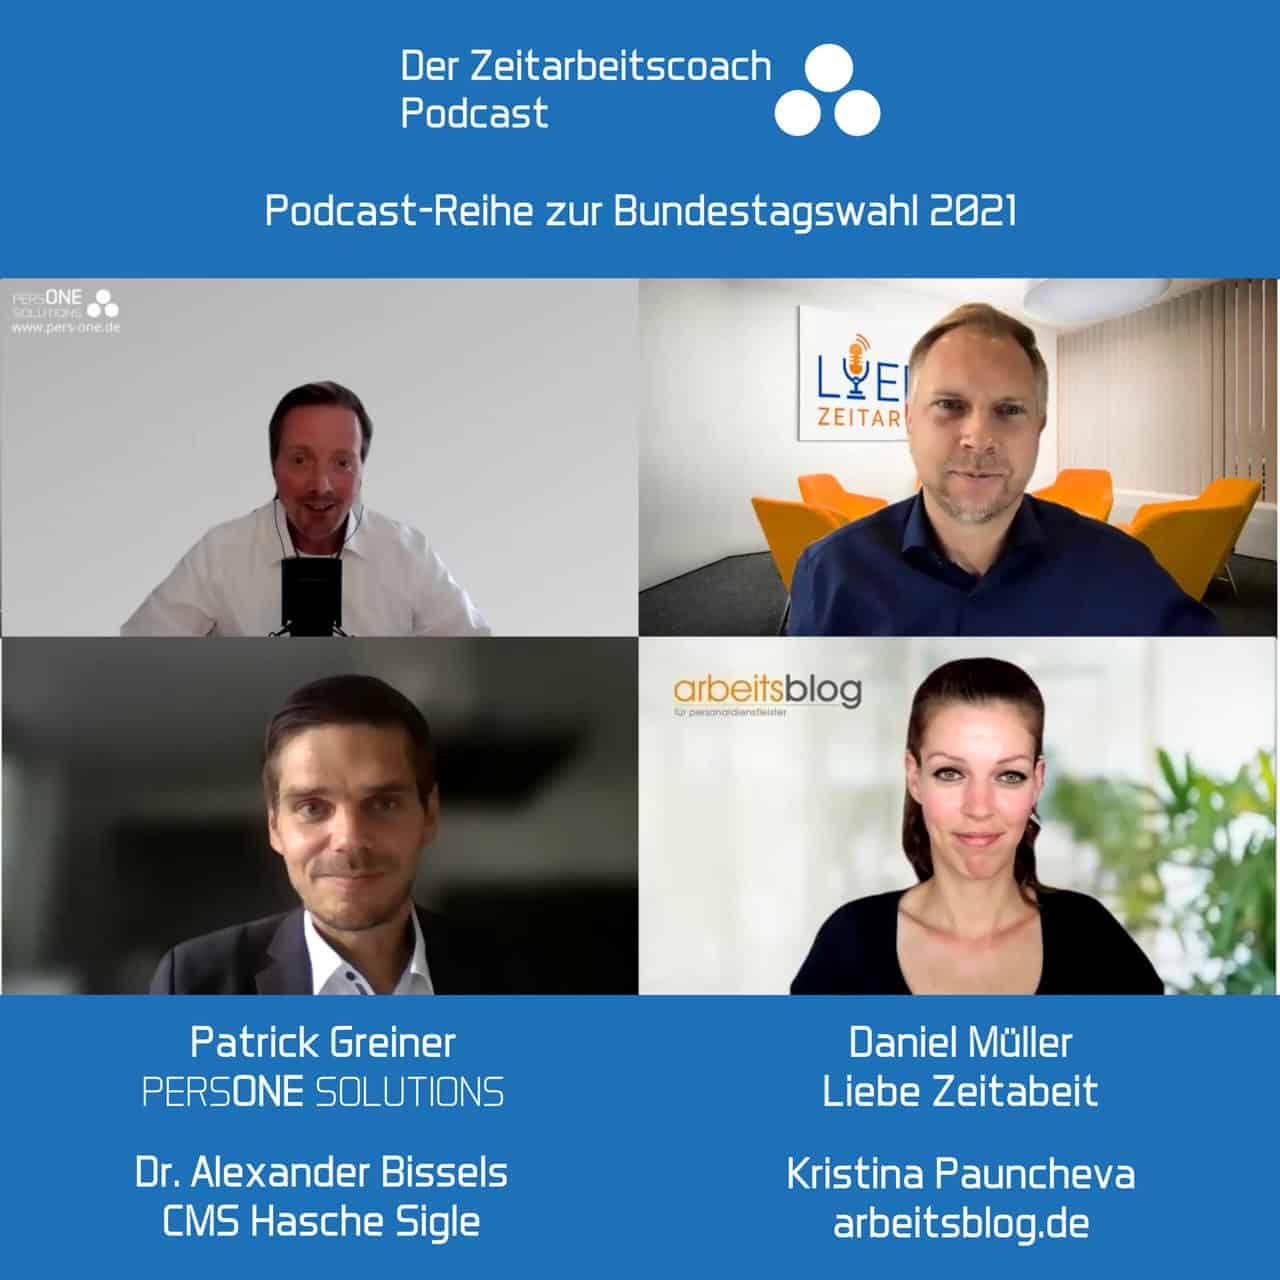 Bundestagswahl 2021_Dr. Bissels, Alexander_Podcast Grafik_Zeitarbeitscoach Podcast